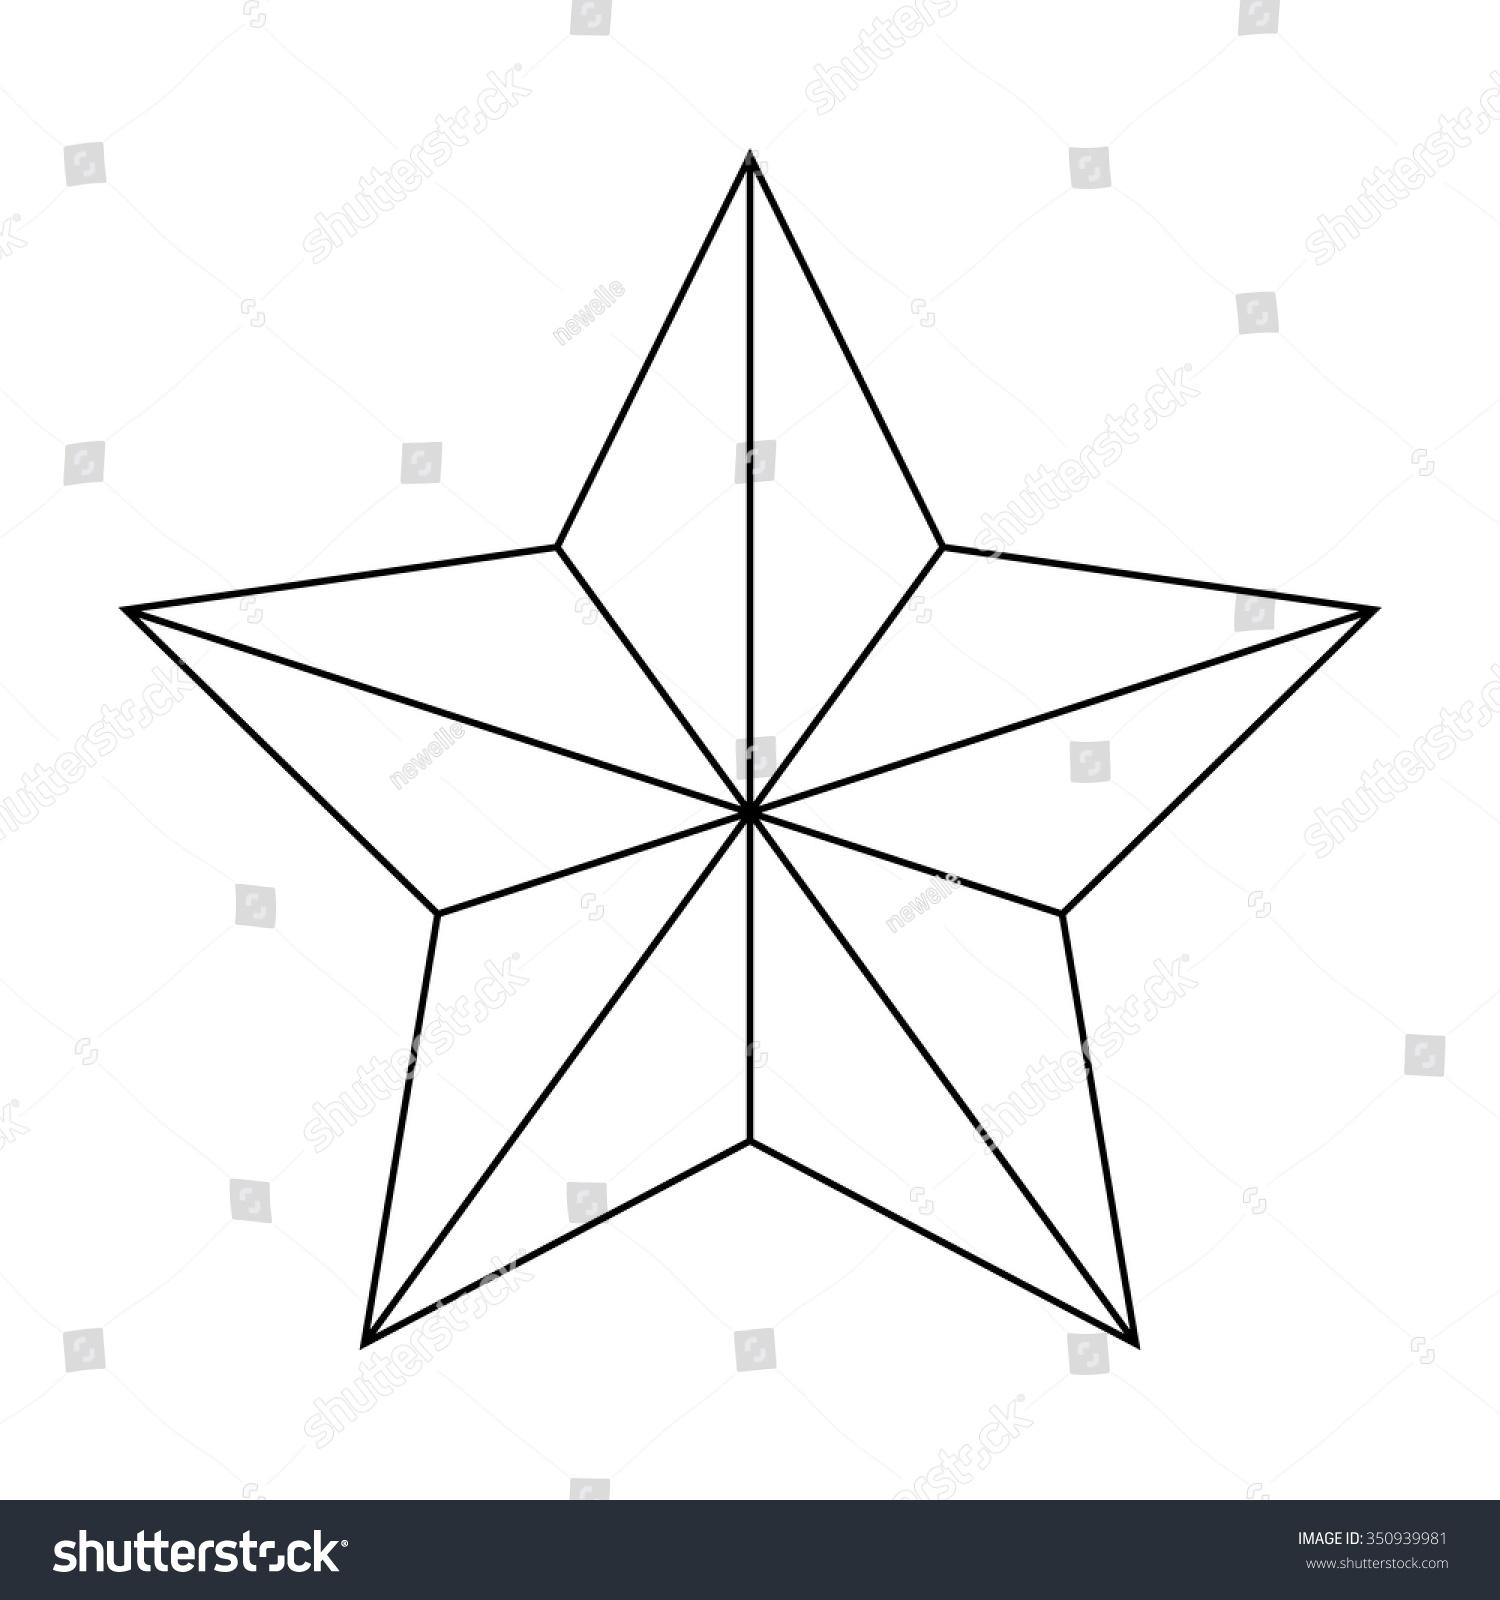 Майнкрафт картинки, шаблон звезды для открытки на 9 мая распечатать